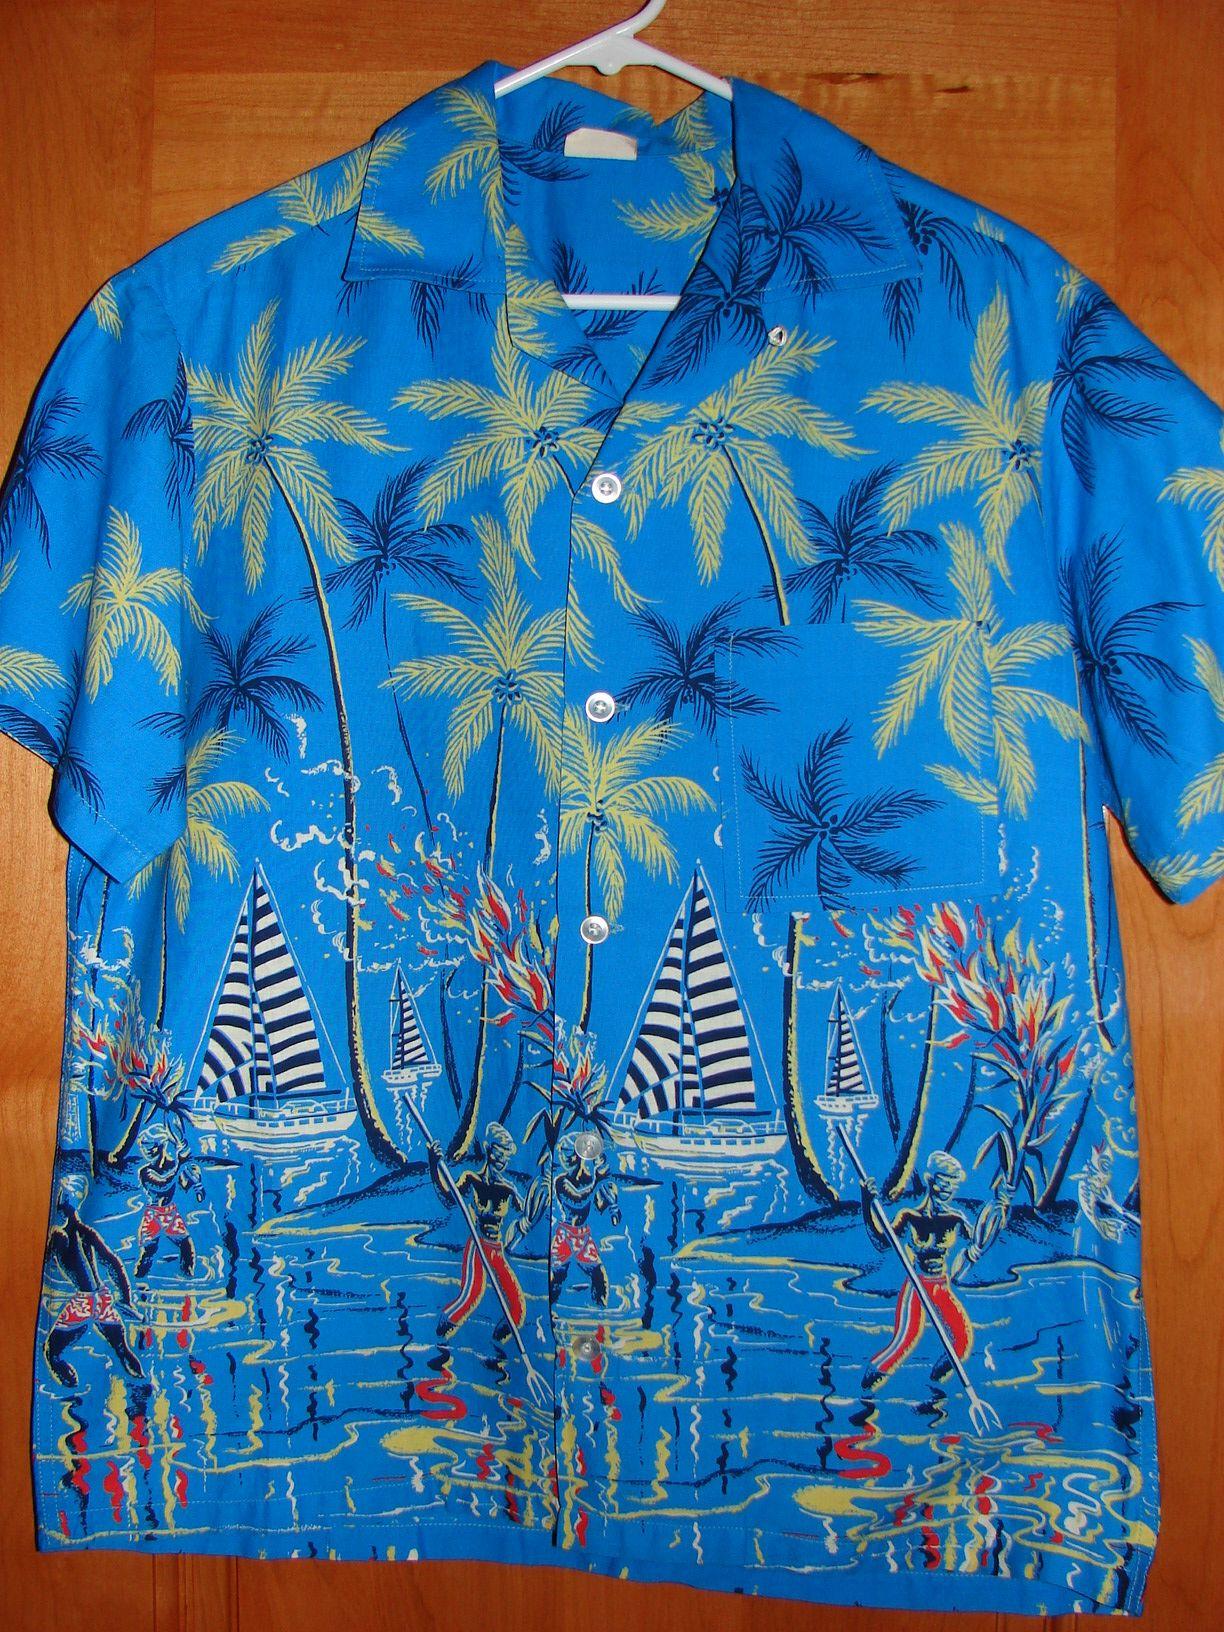 70s Aloha Shirt/ Hawaiian Shirt/ Vintage Aloha Shirt/ Mc Gregor Swim & Wear/ Small QqSeDkEXG